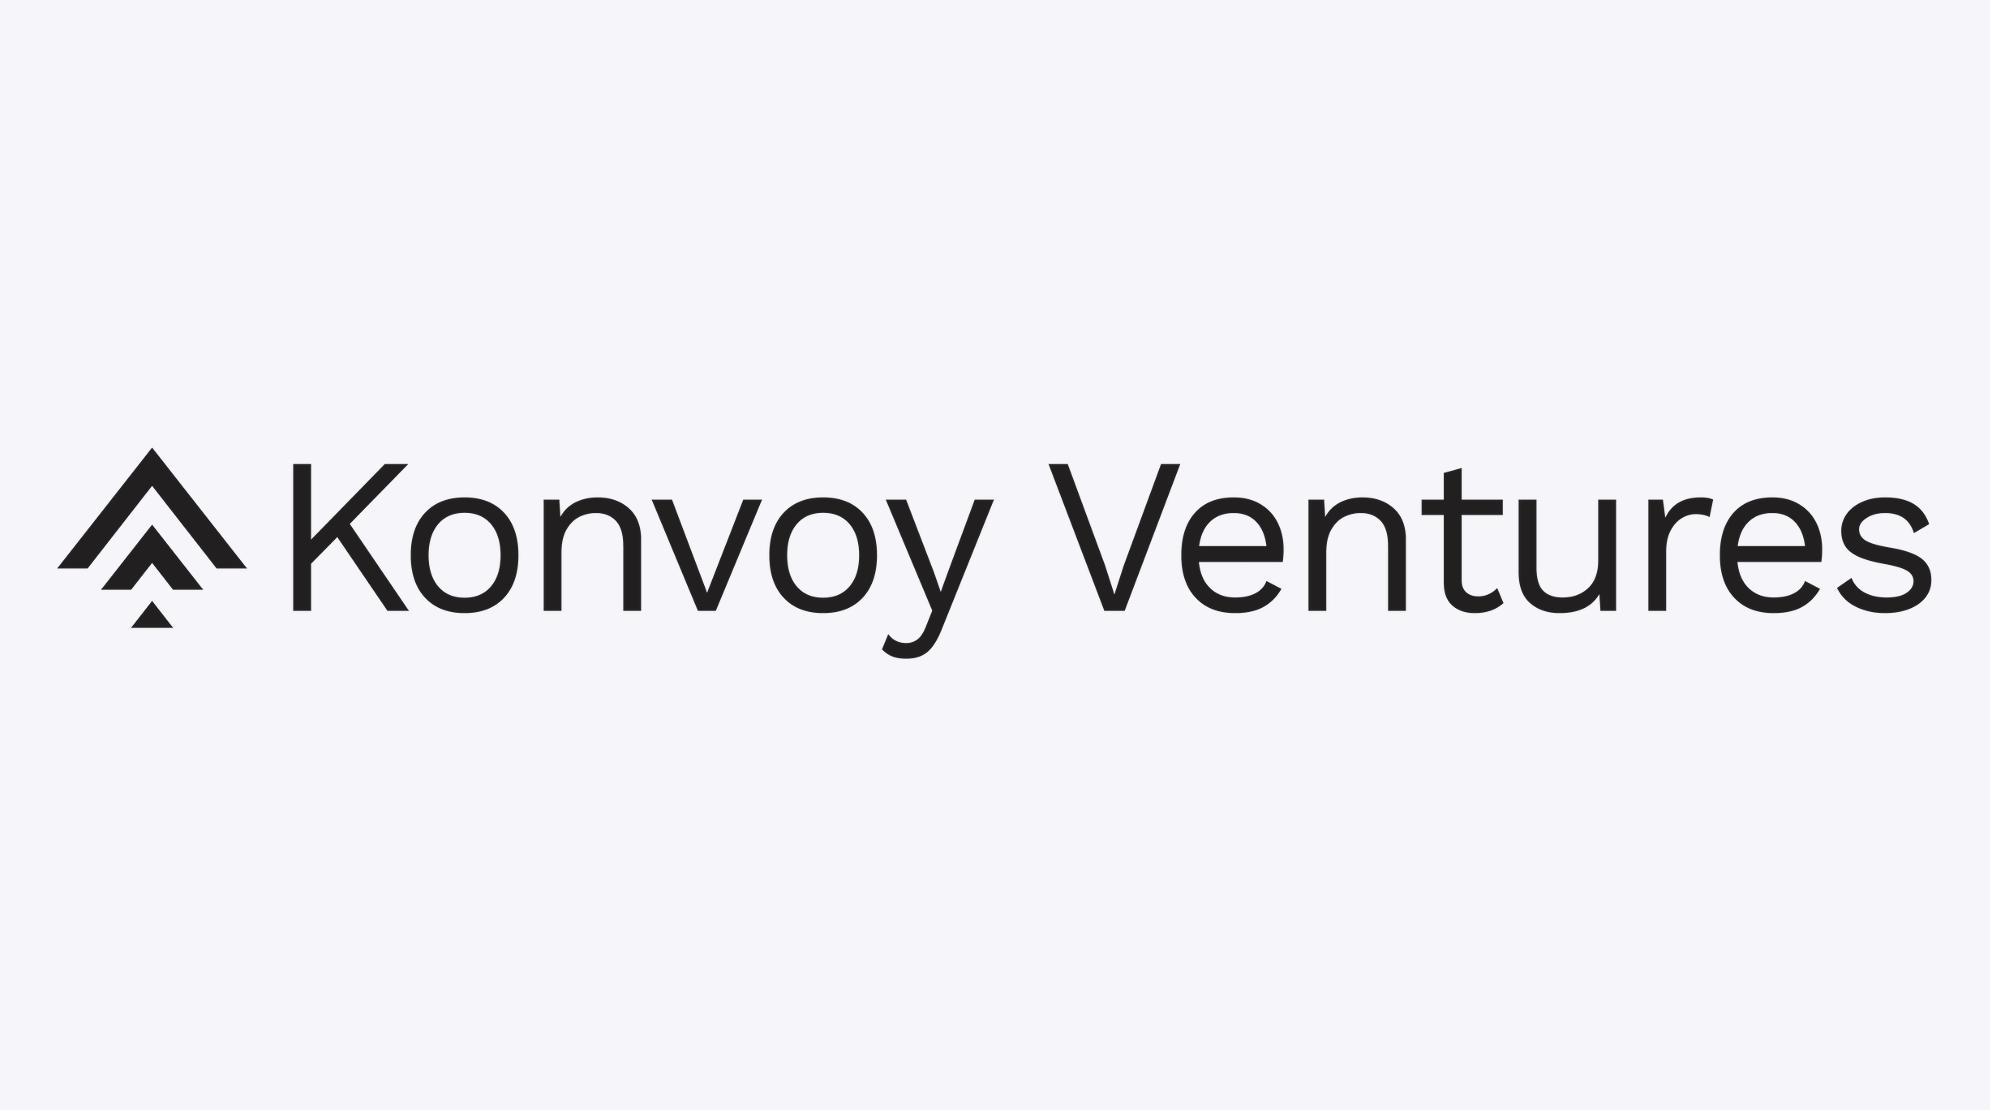 Konvoy Ventures